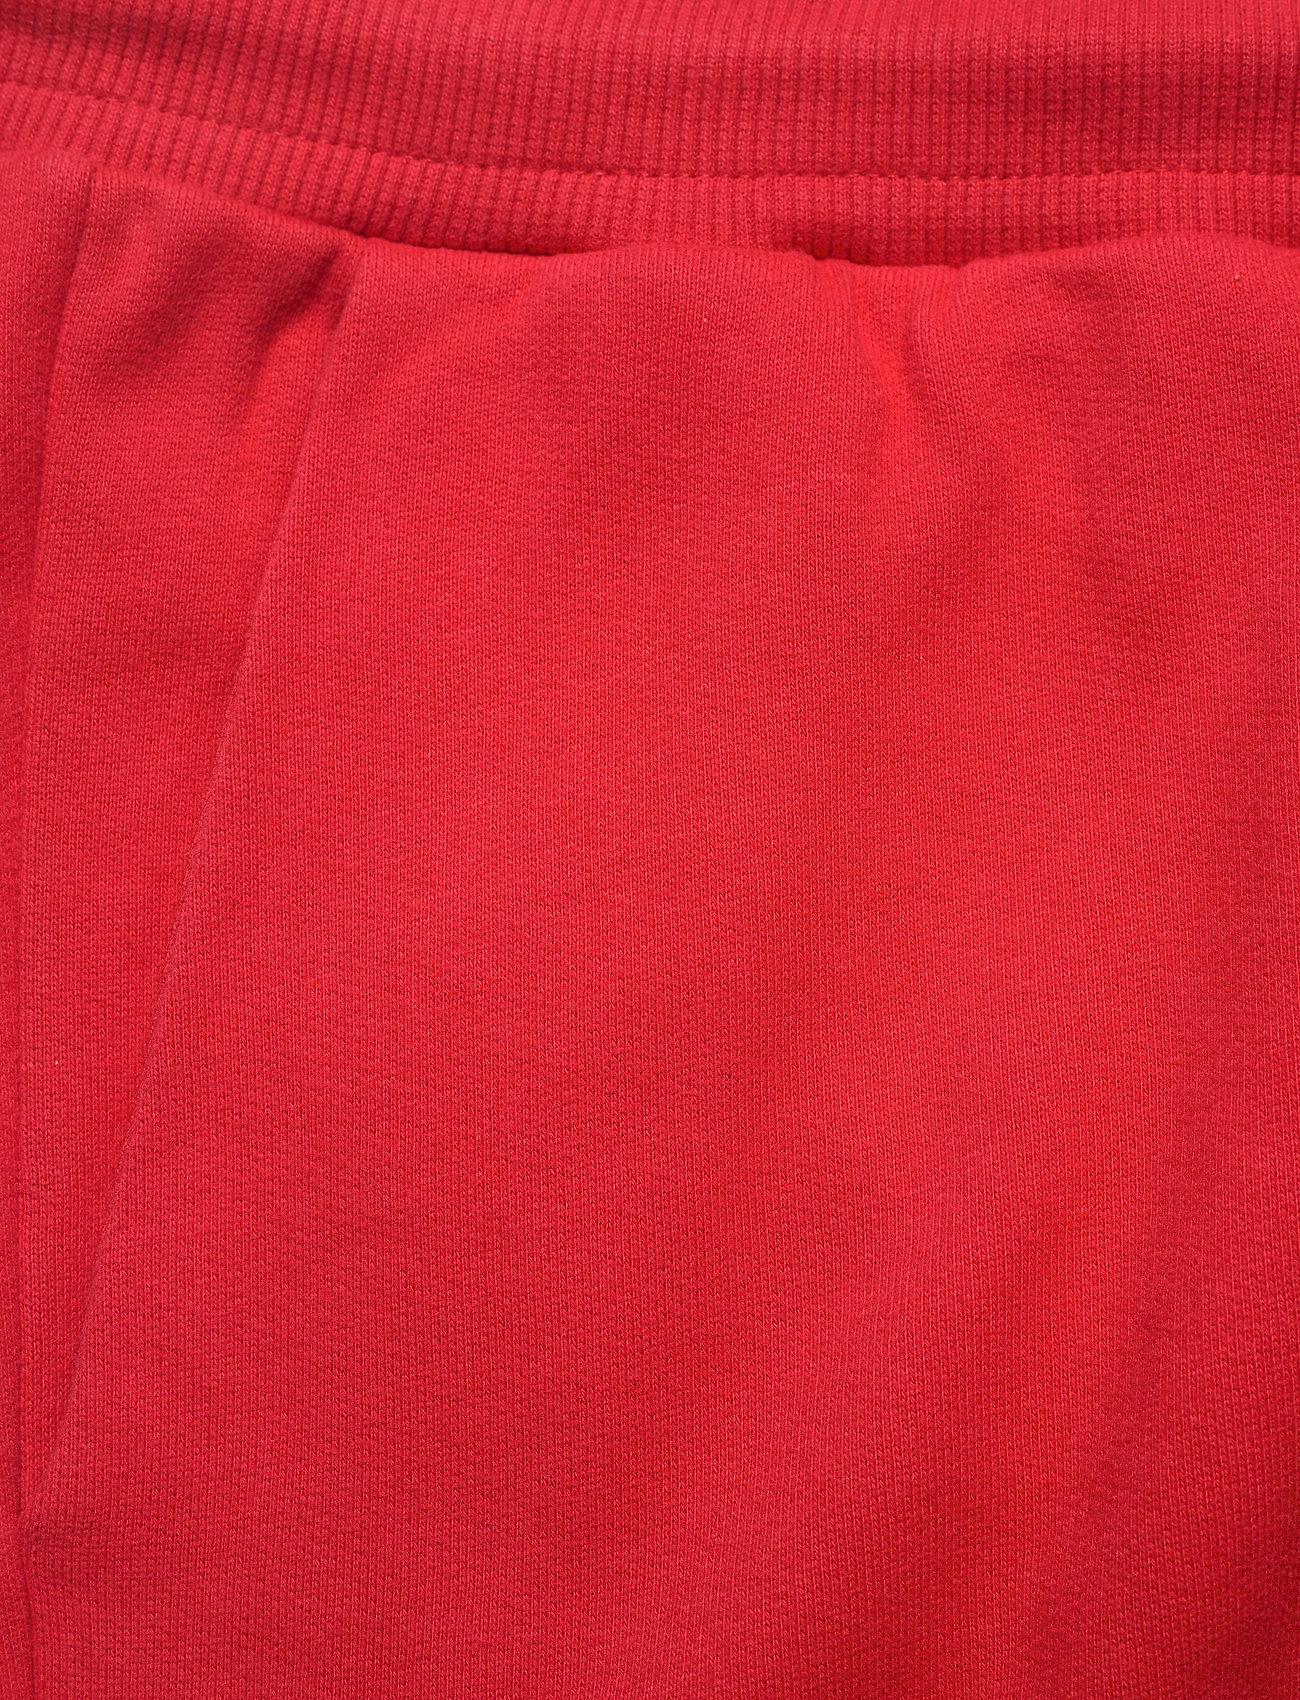 Calvin Klein Jeans - MONOGRAM JOG PANT - odzież - racing red - 2